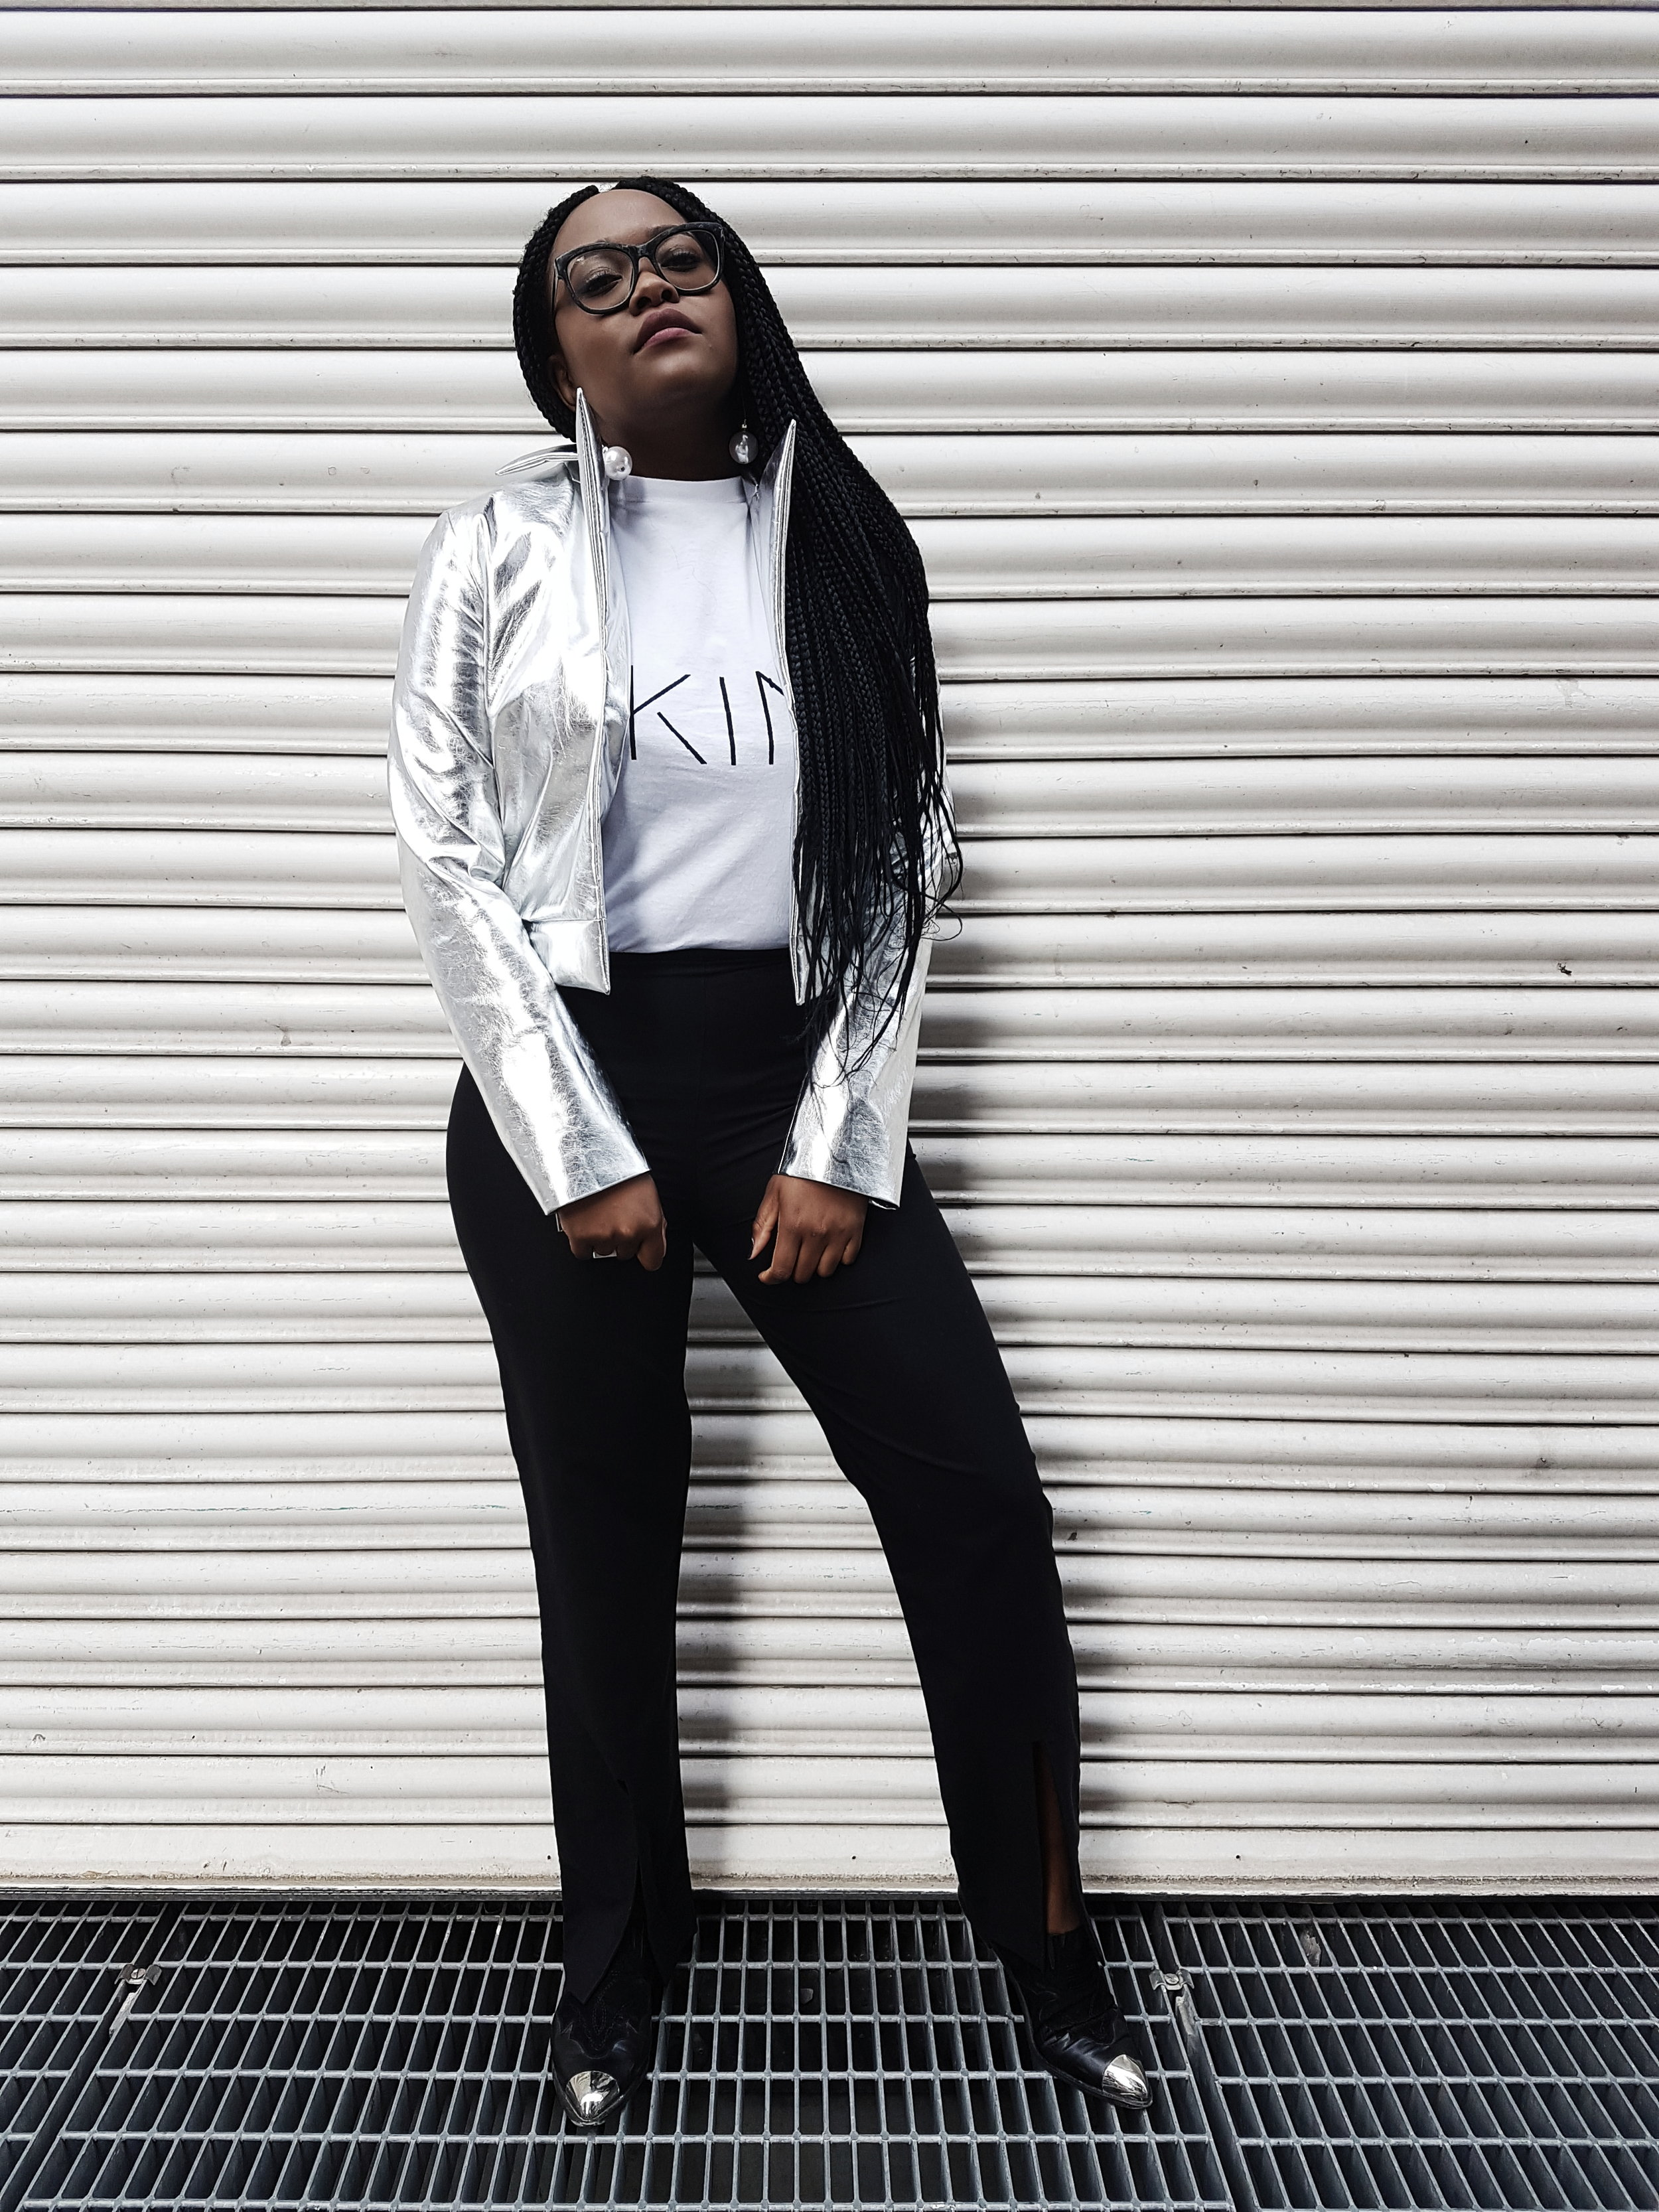 - Ngoni, 24, Creative Director, London/Northampton/Wherever my mother is.